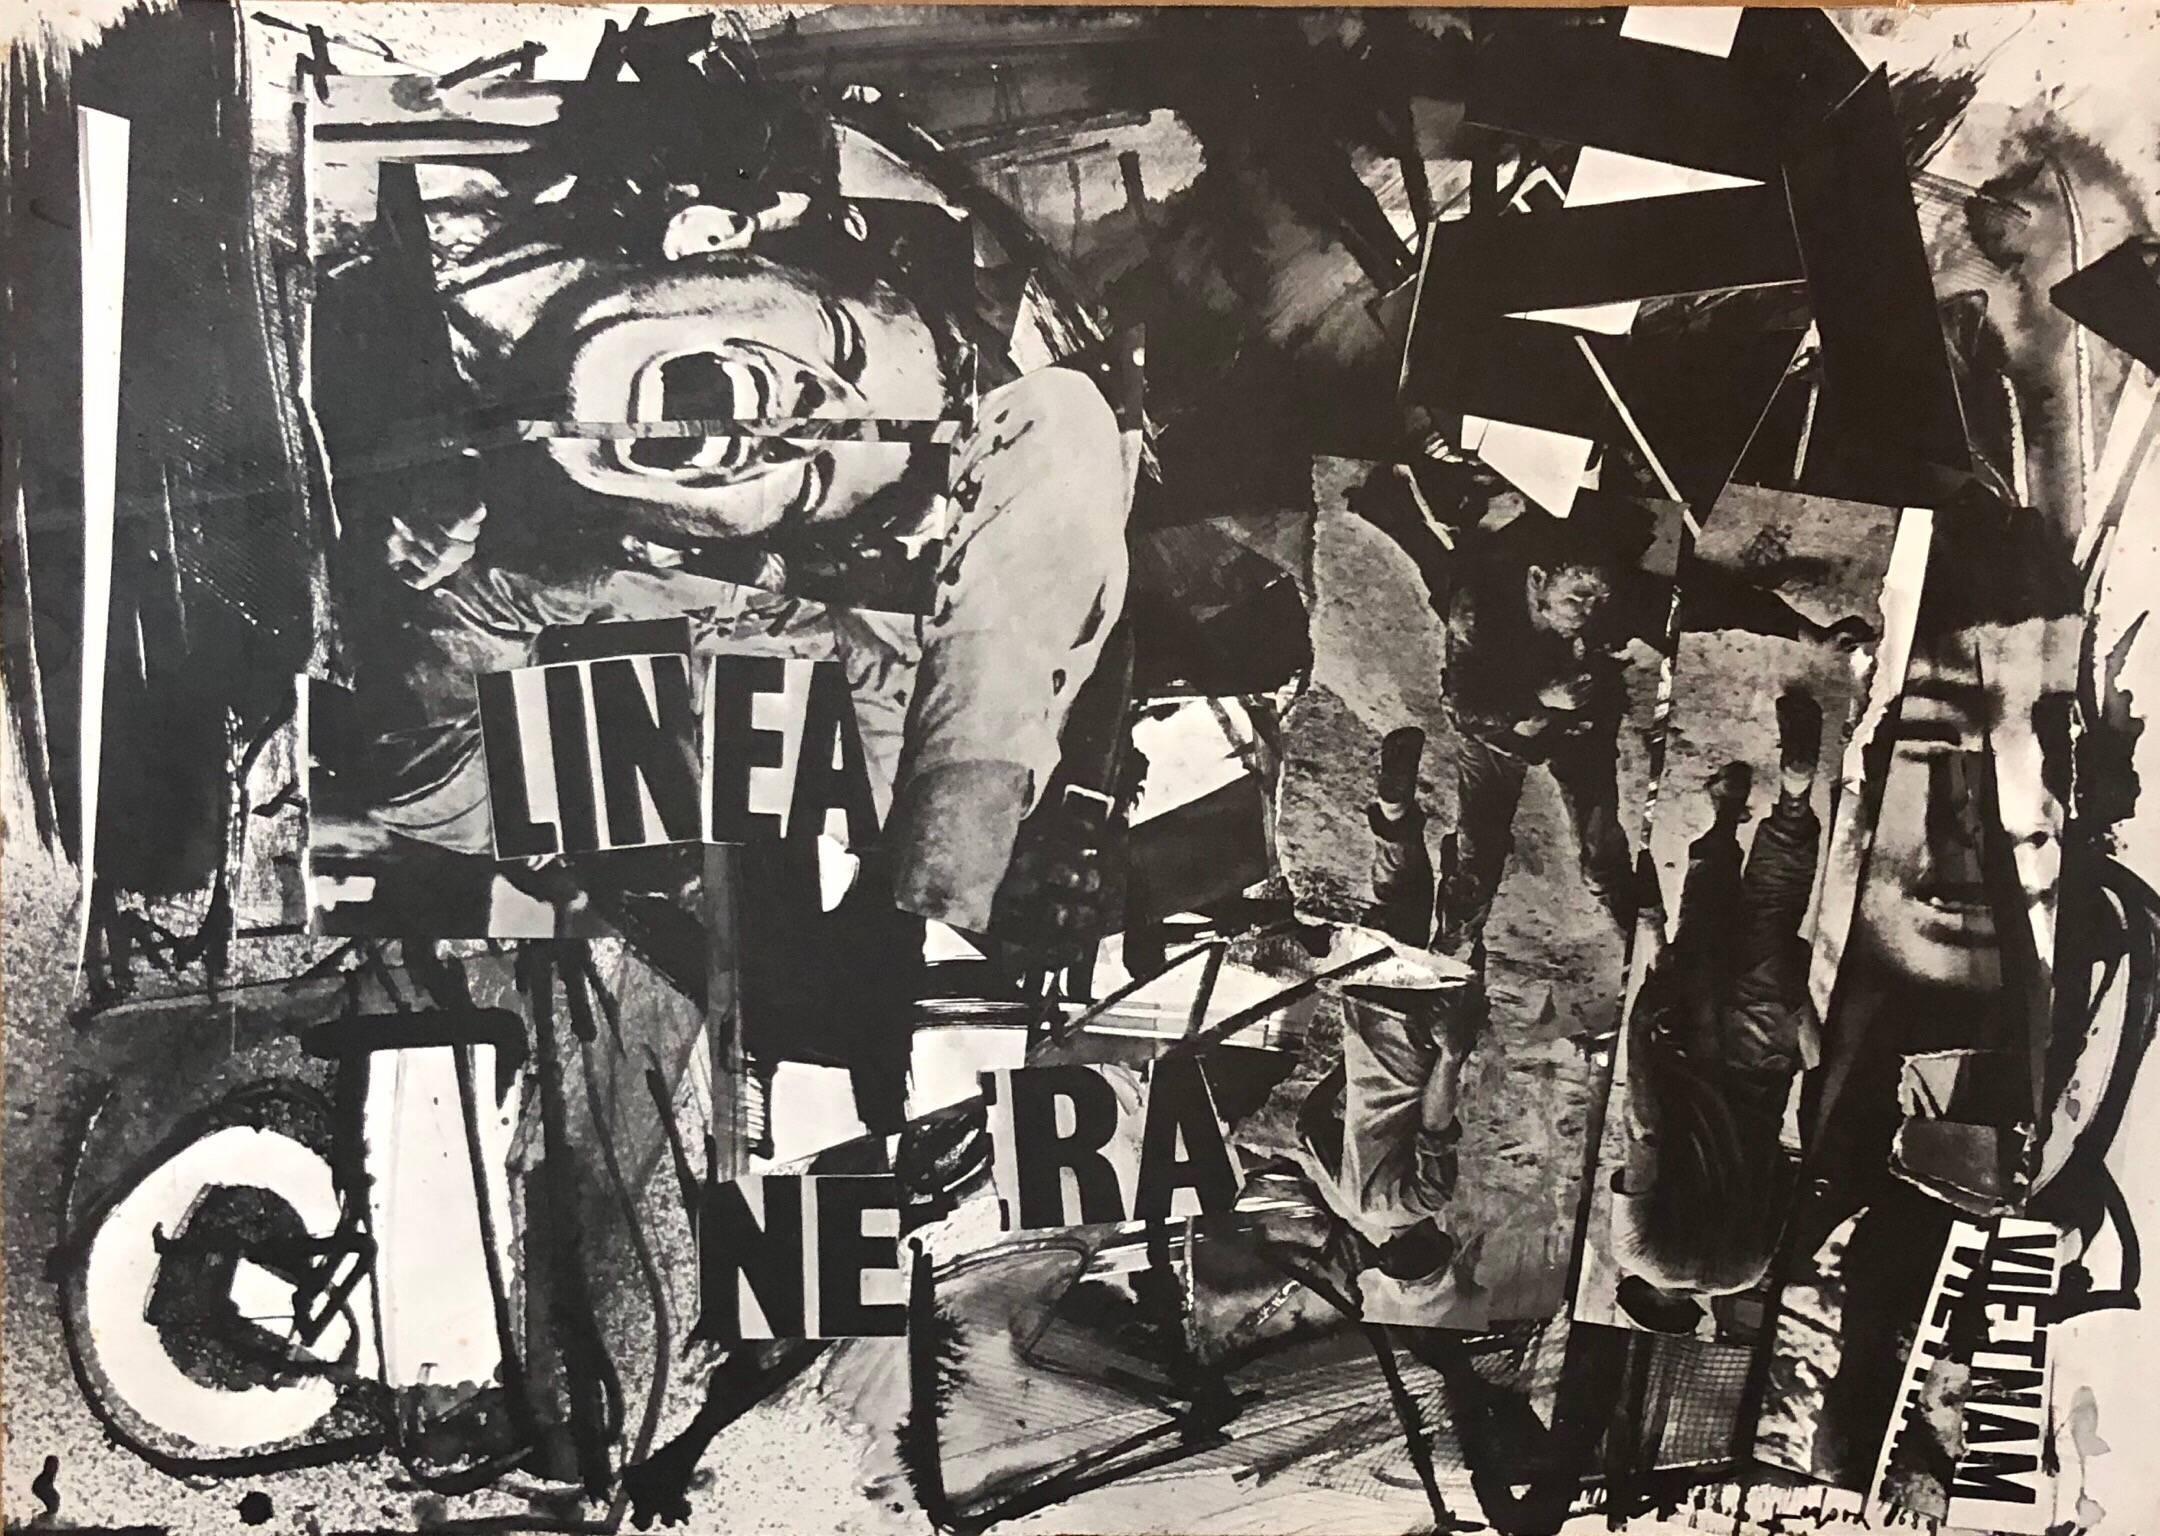 Italian Abstract Collage 'Linea Nera' Large Screenprint 1960s Vietnam Era